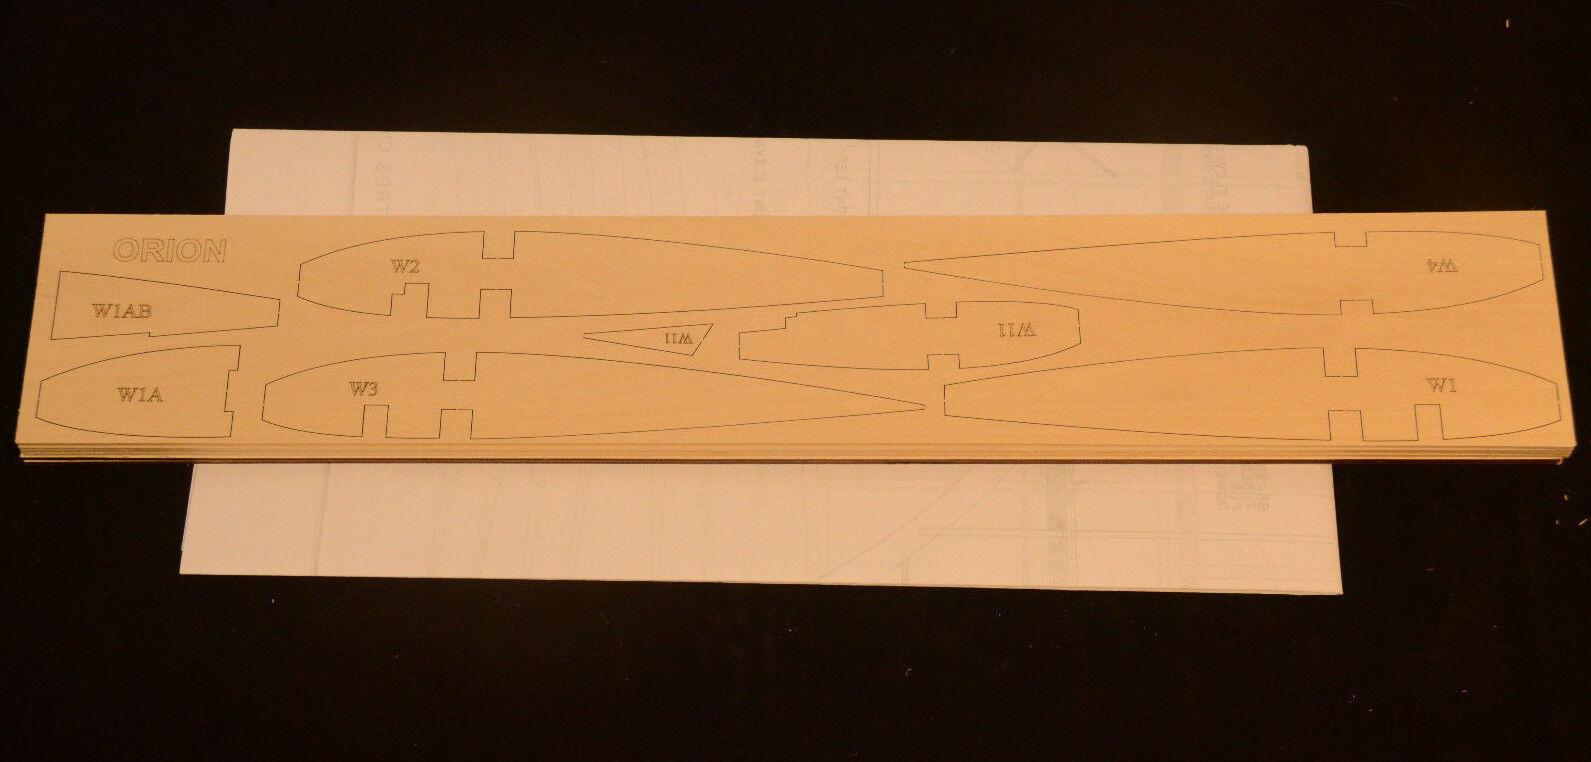 Sport Pattern ORION Laser Cut Short Kit, Plans & Instruction 68 in. wing span